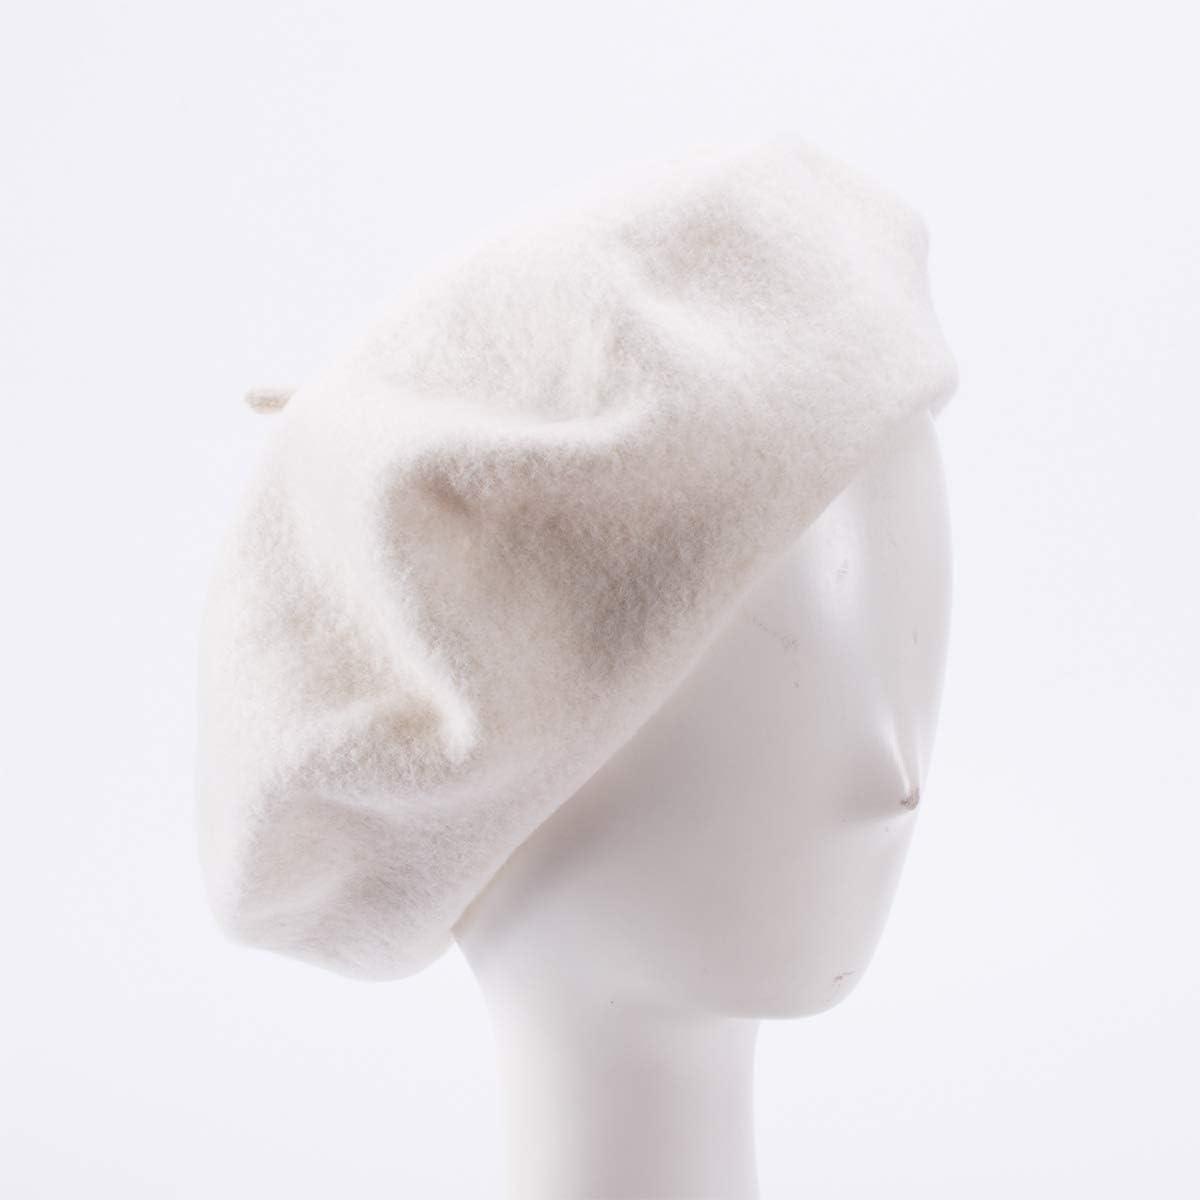 LYEJM Womens Winter Warm Rivet Real Leather Adjustable Painter Beret Caps Outdoor Durable Forward Hat